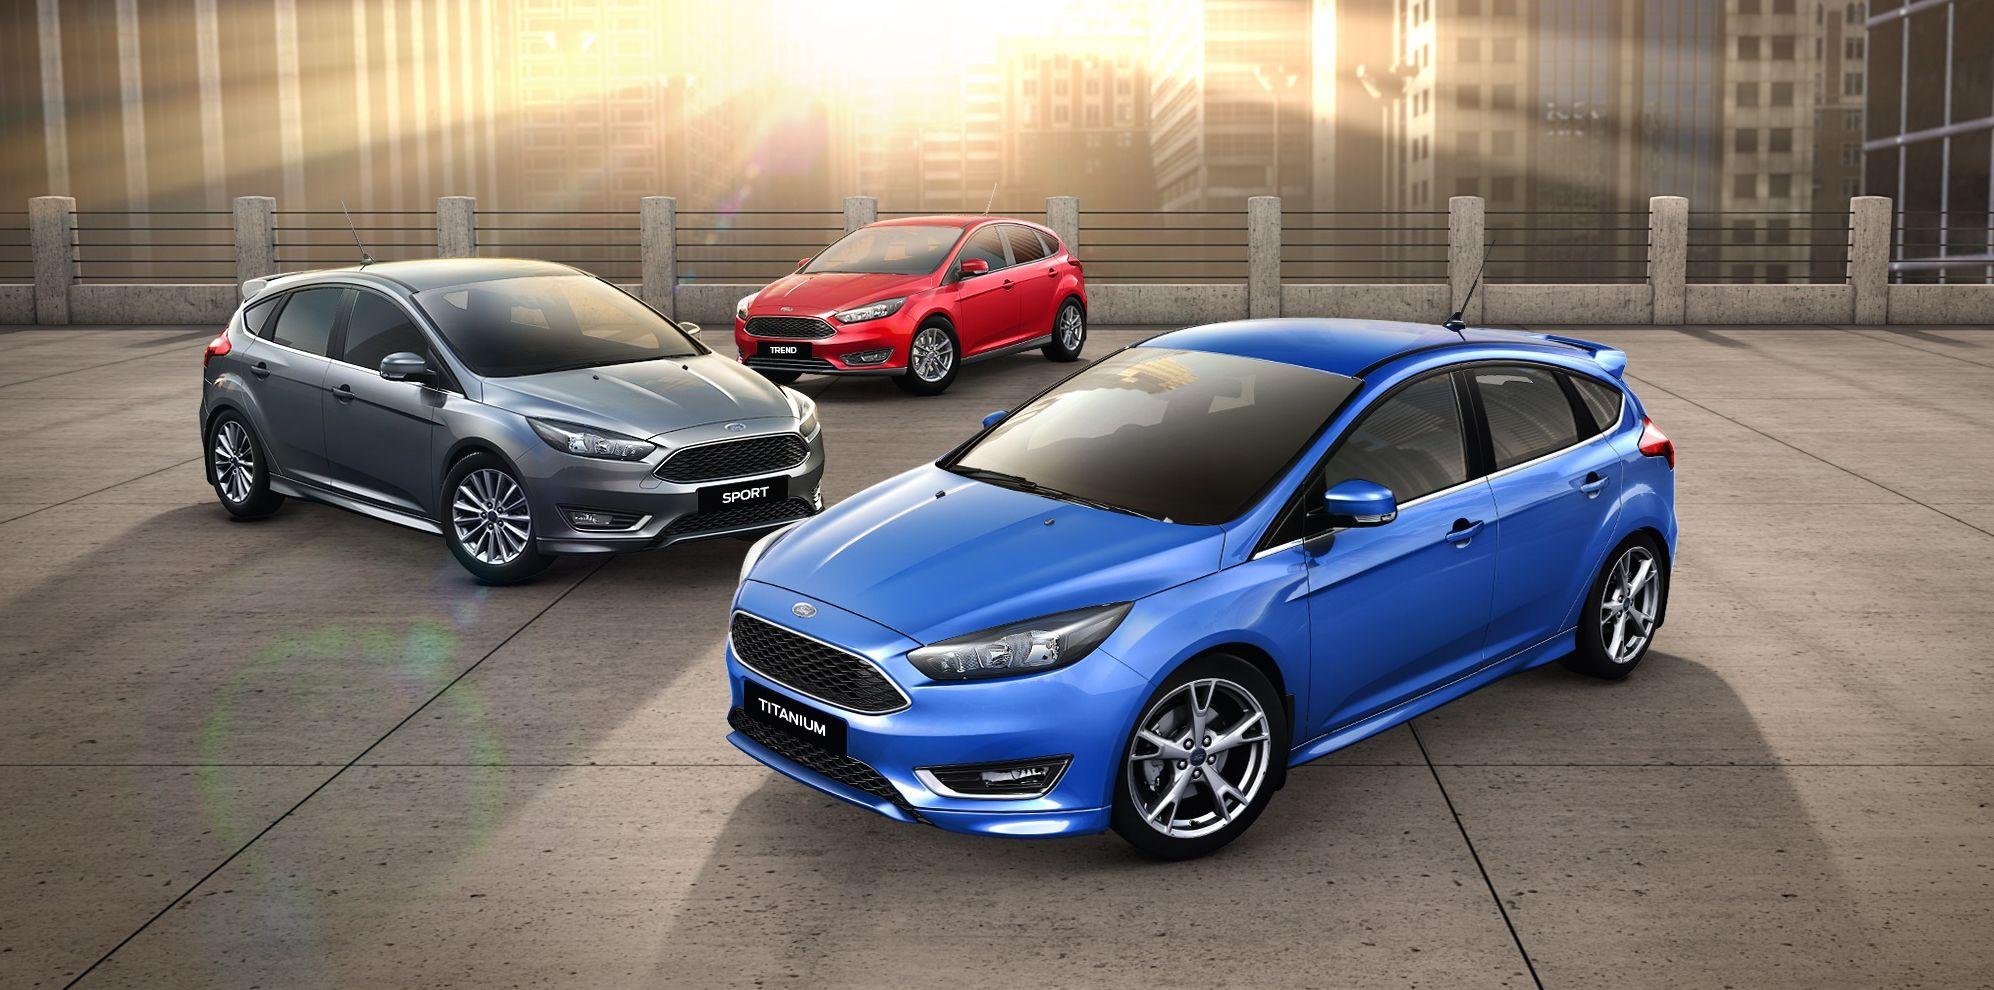 СтаРи известны цены на новый Ford Focus